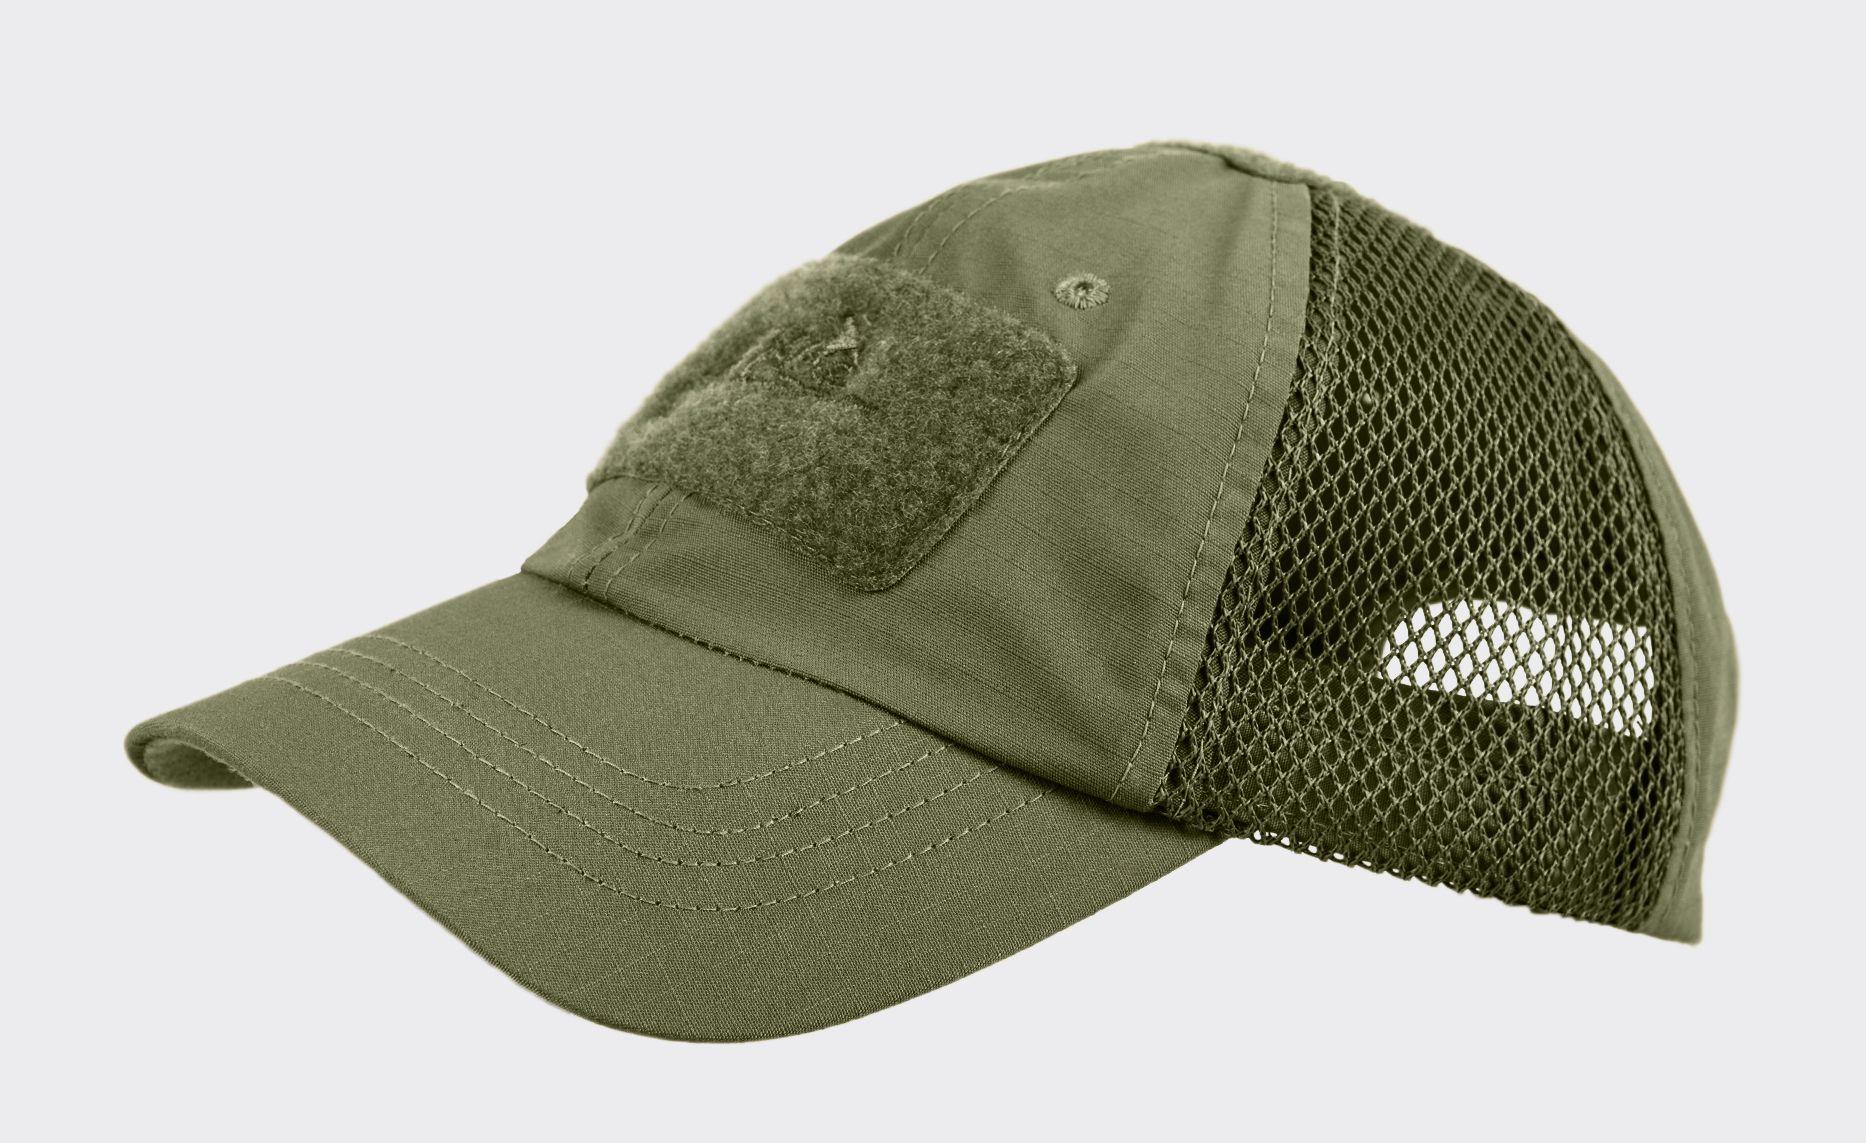 653771e5c Helikon Tex Tactical Baseball cap full mesh Black | Baseball caps ...